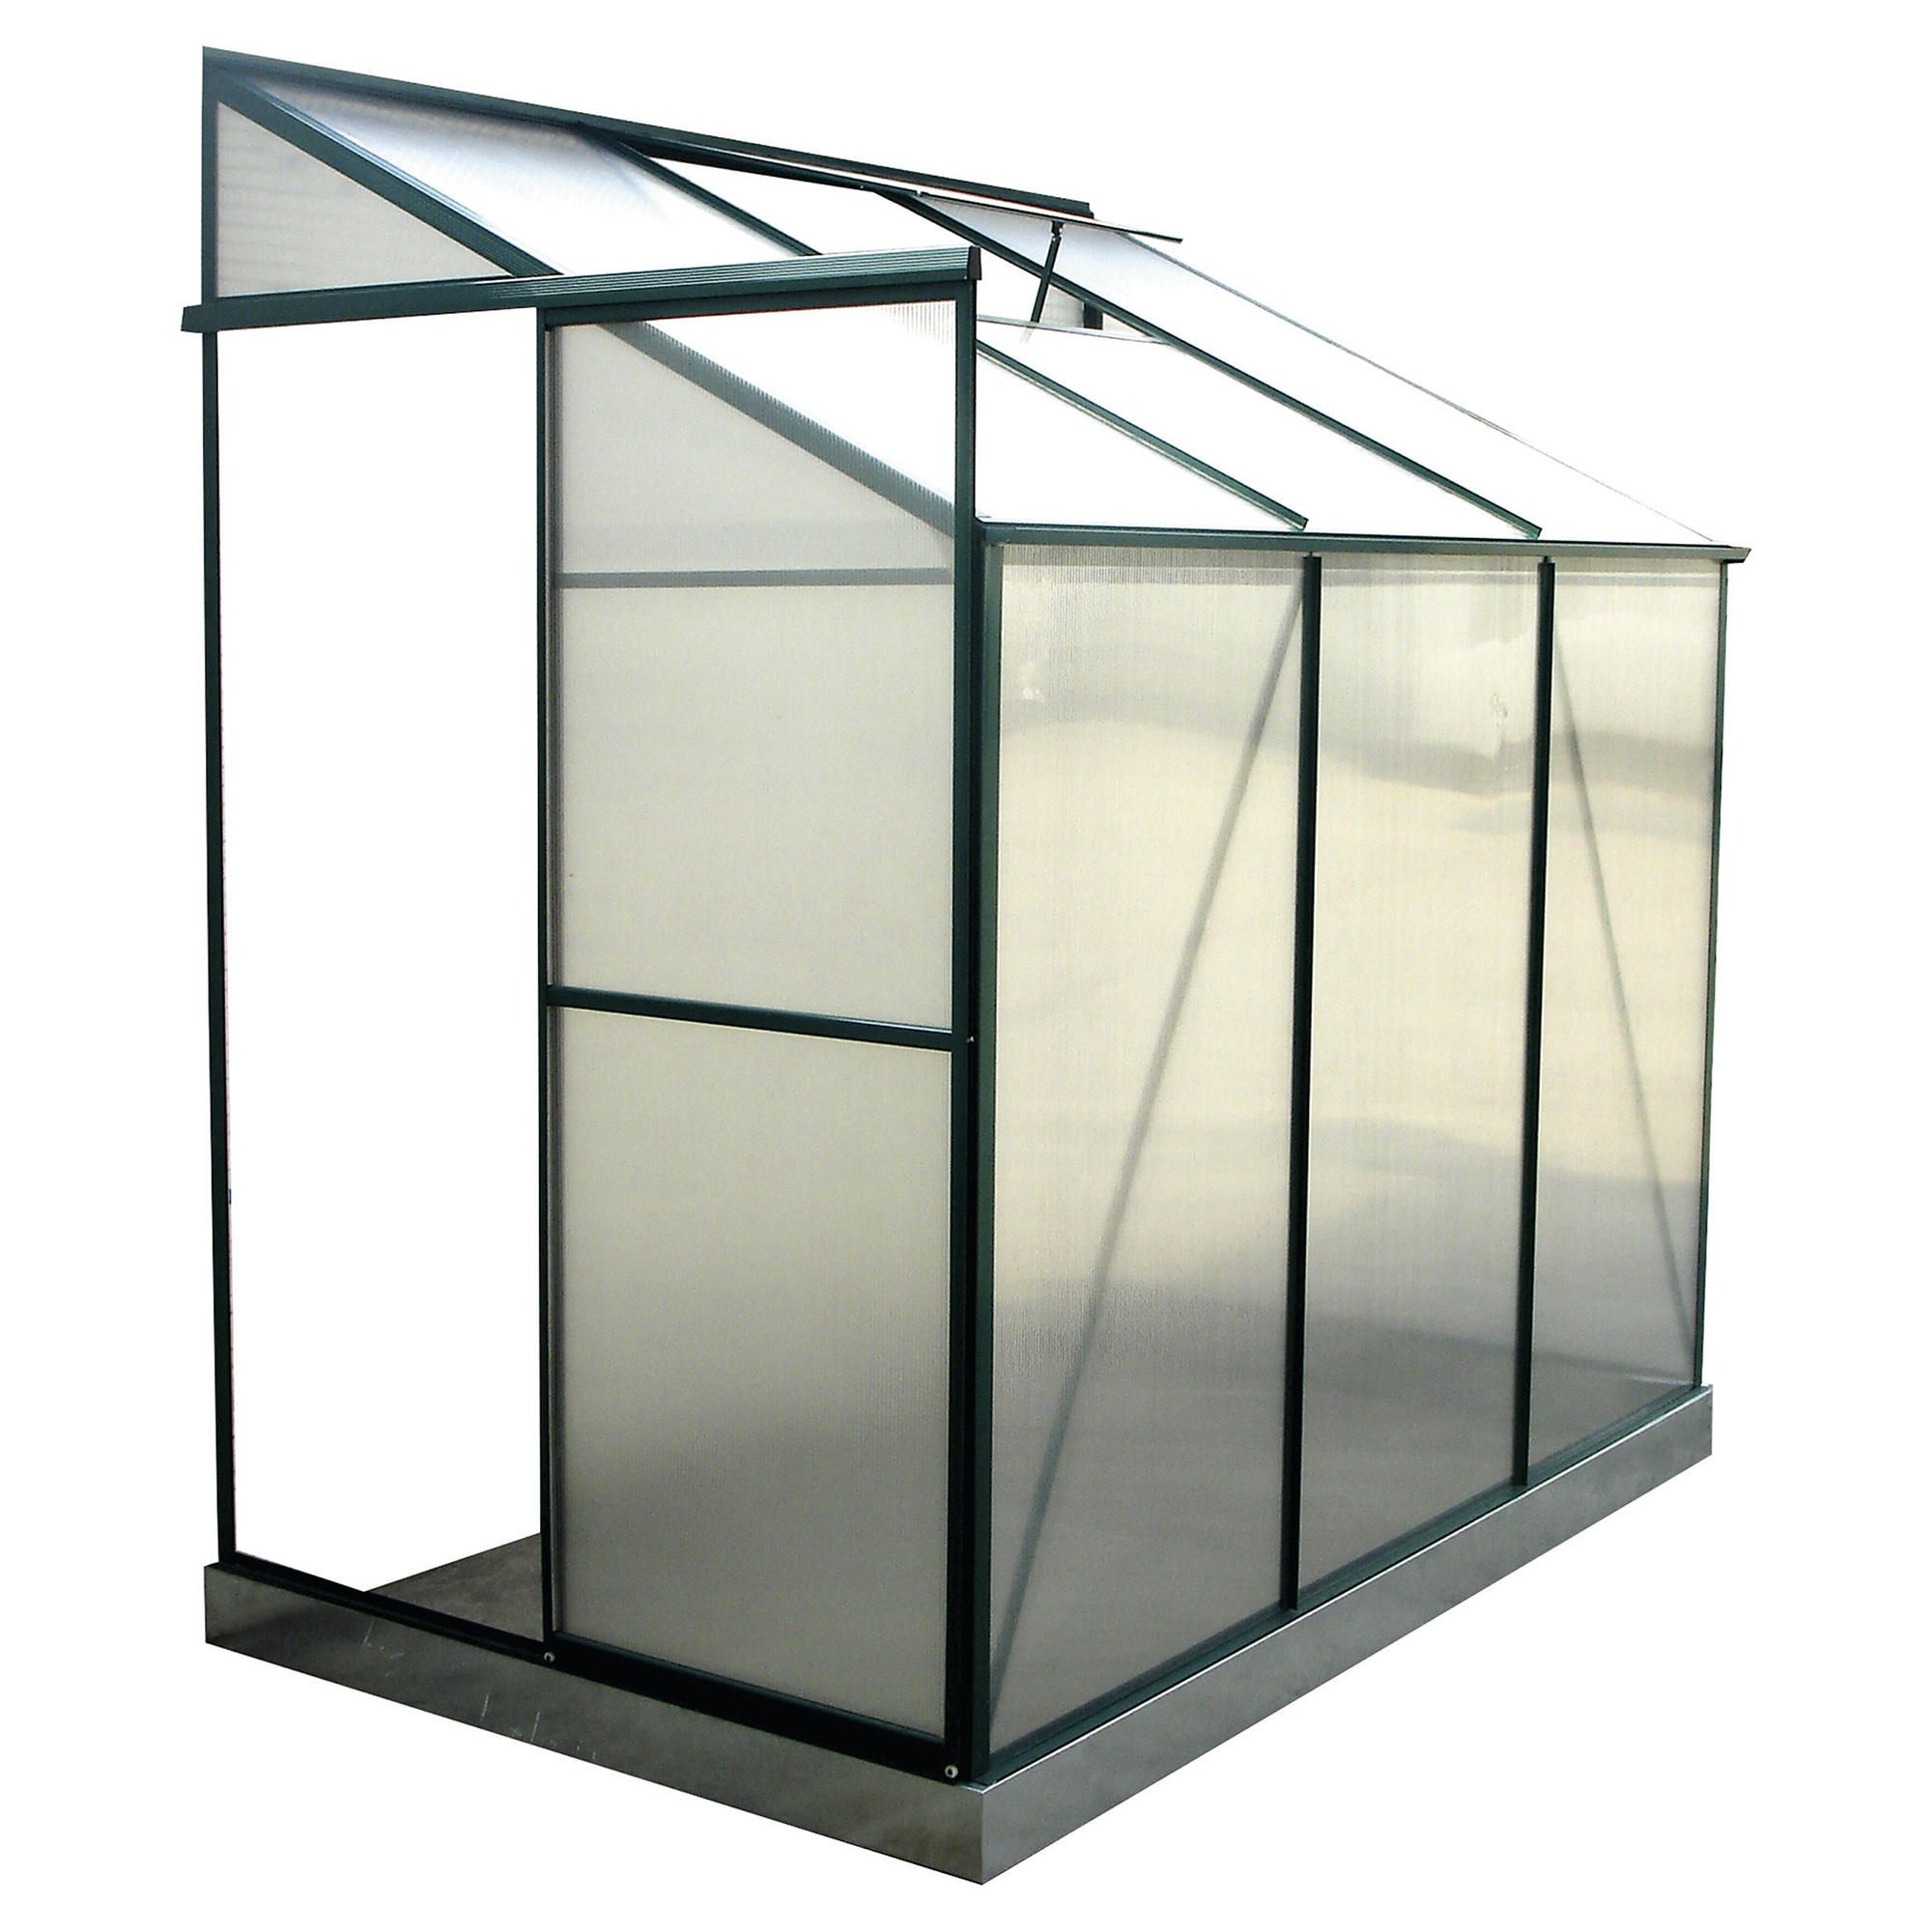 Walton 6 x 4 Aluminium & Polycarb Lean-To Greenhouse at Tesco Direct